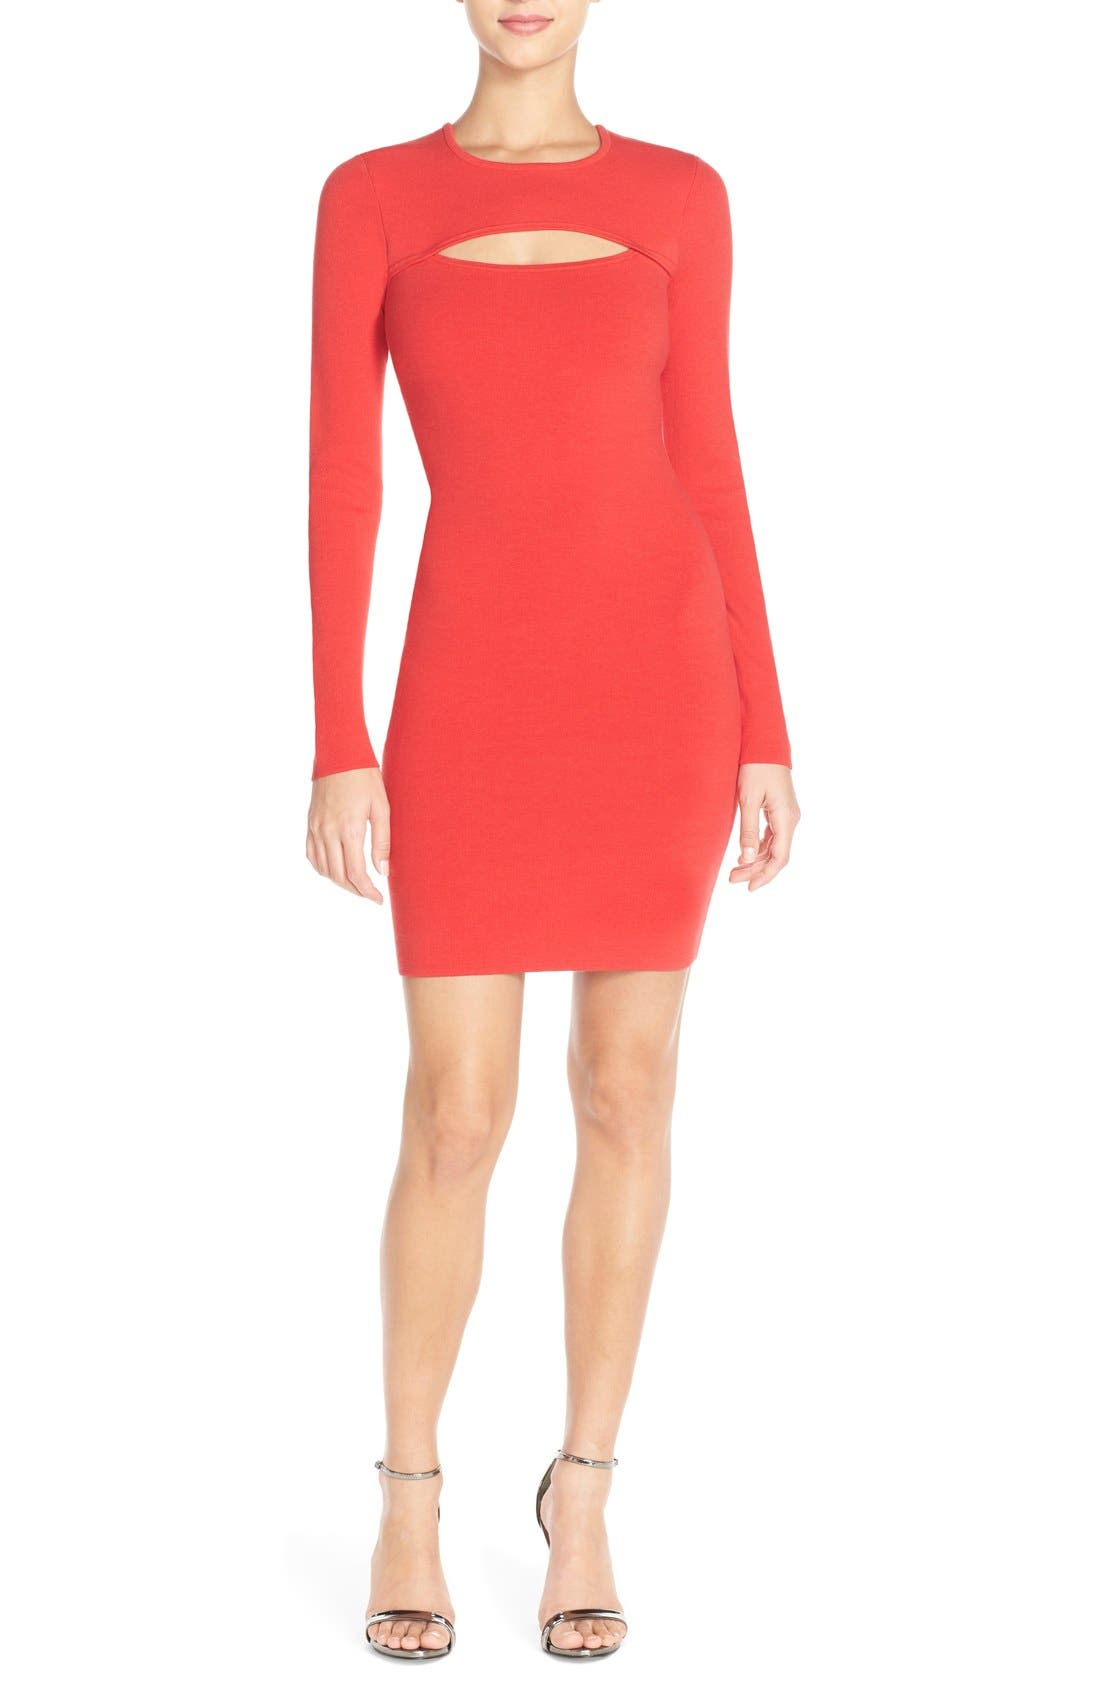 Main Image - BCBGMAXAZRIA 'Fyonna' Cutout Sweater Body-Con Dress